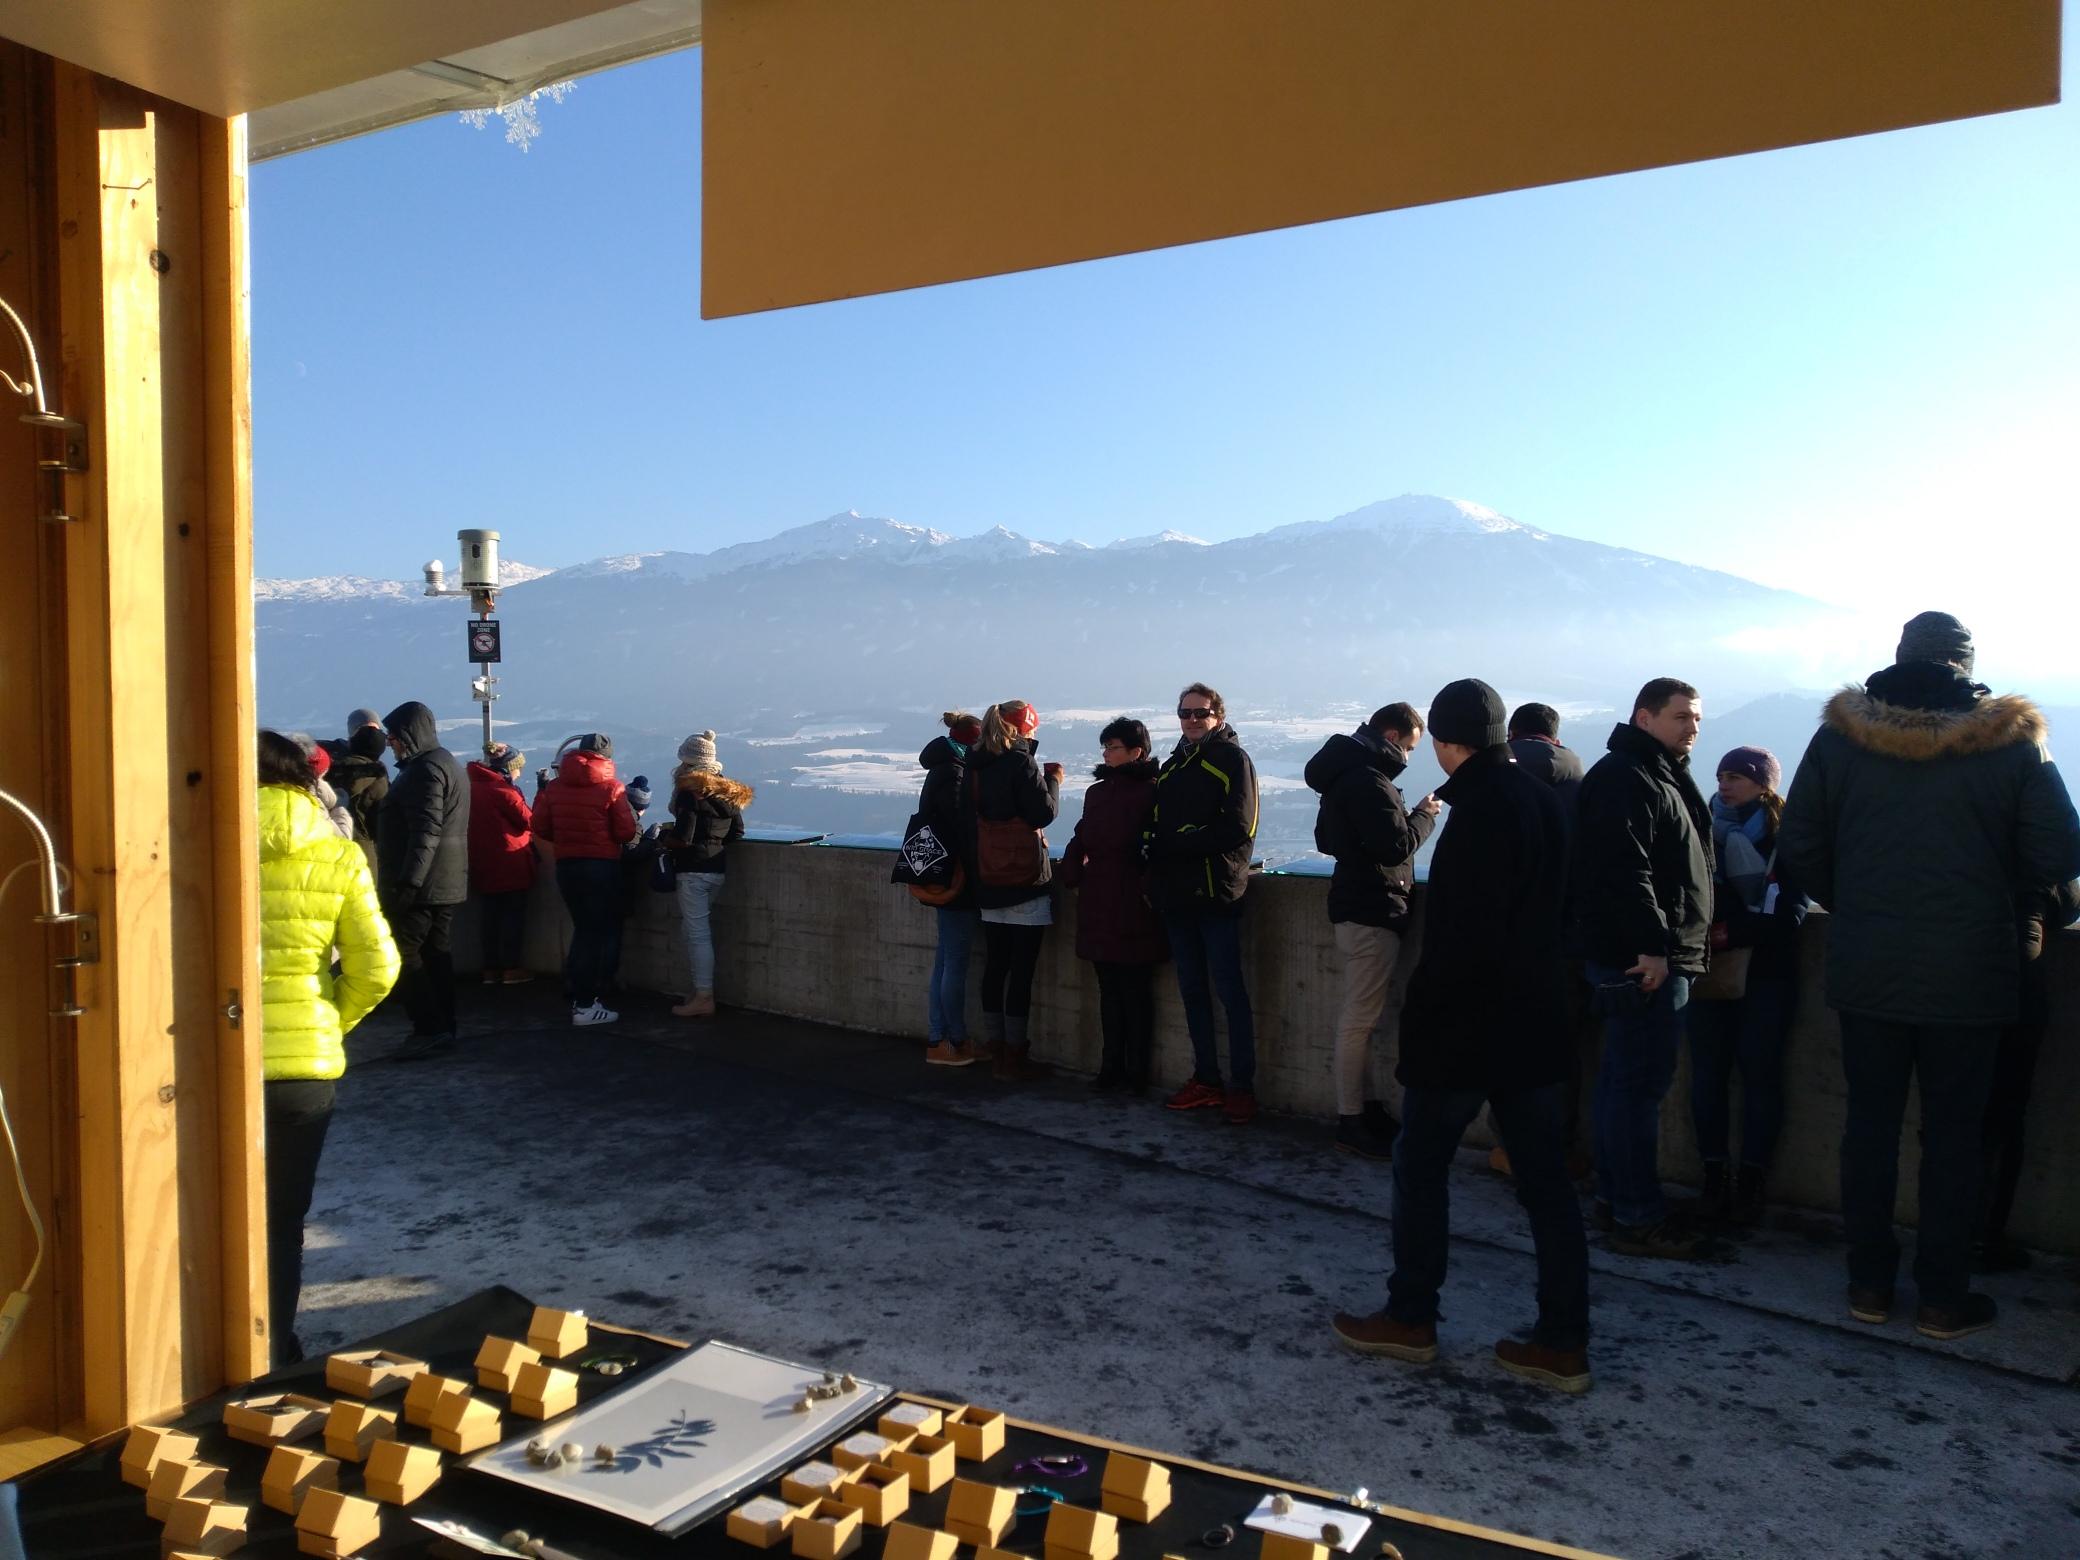 Christkindlmarkt Hungerburg in Innsbruck, Tyrol